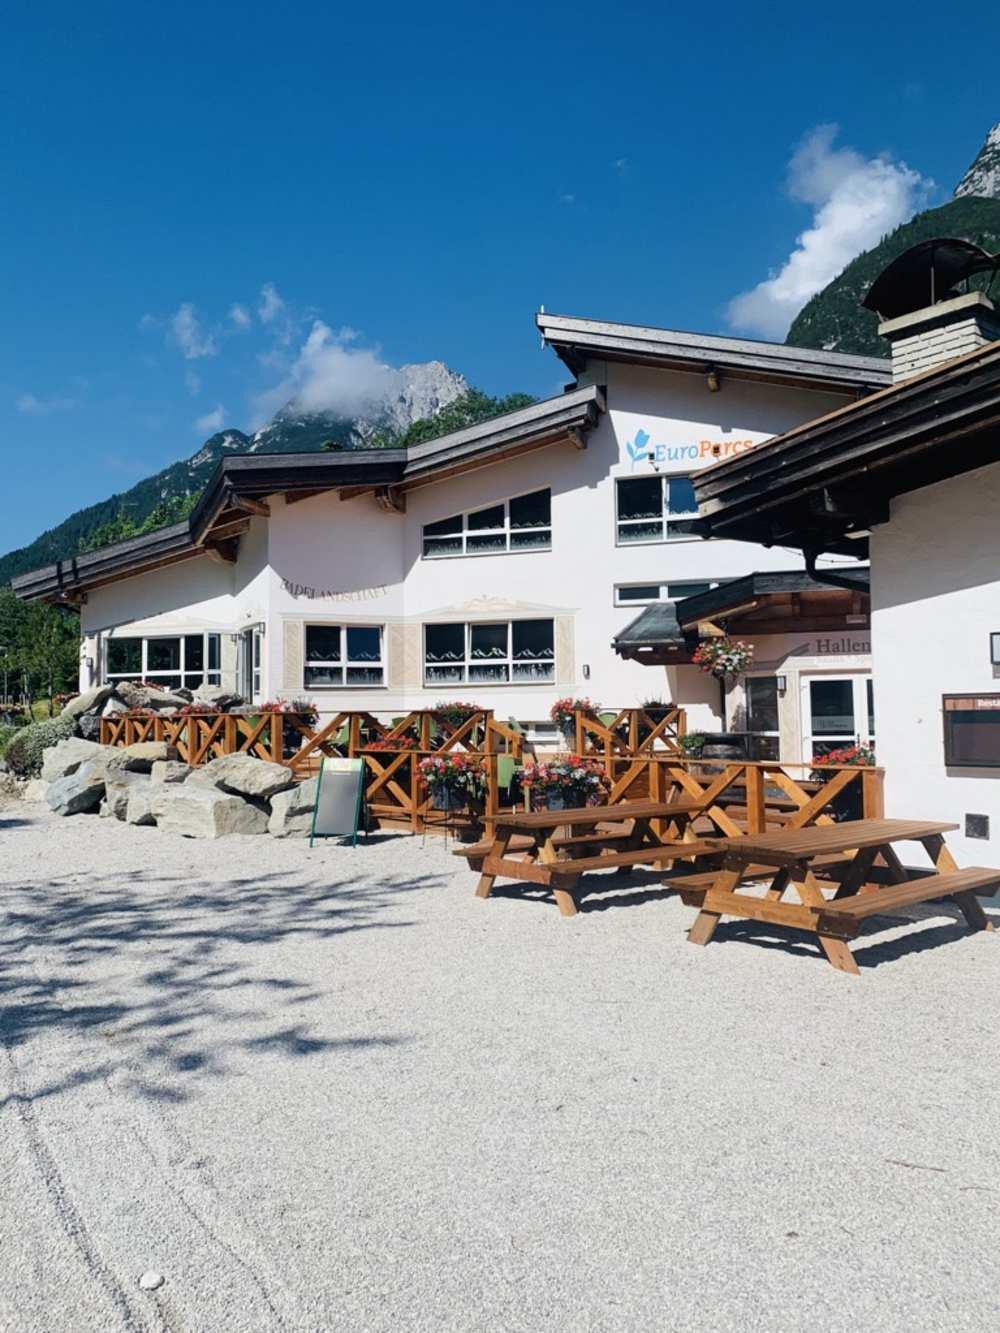 Fotoalbum Alpenresort Olympiaregion Seefeld